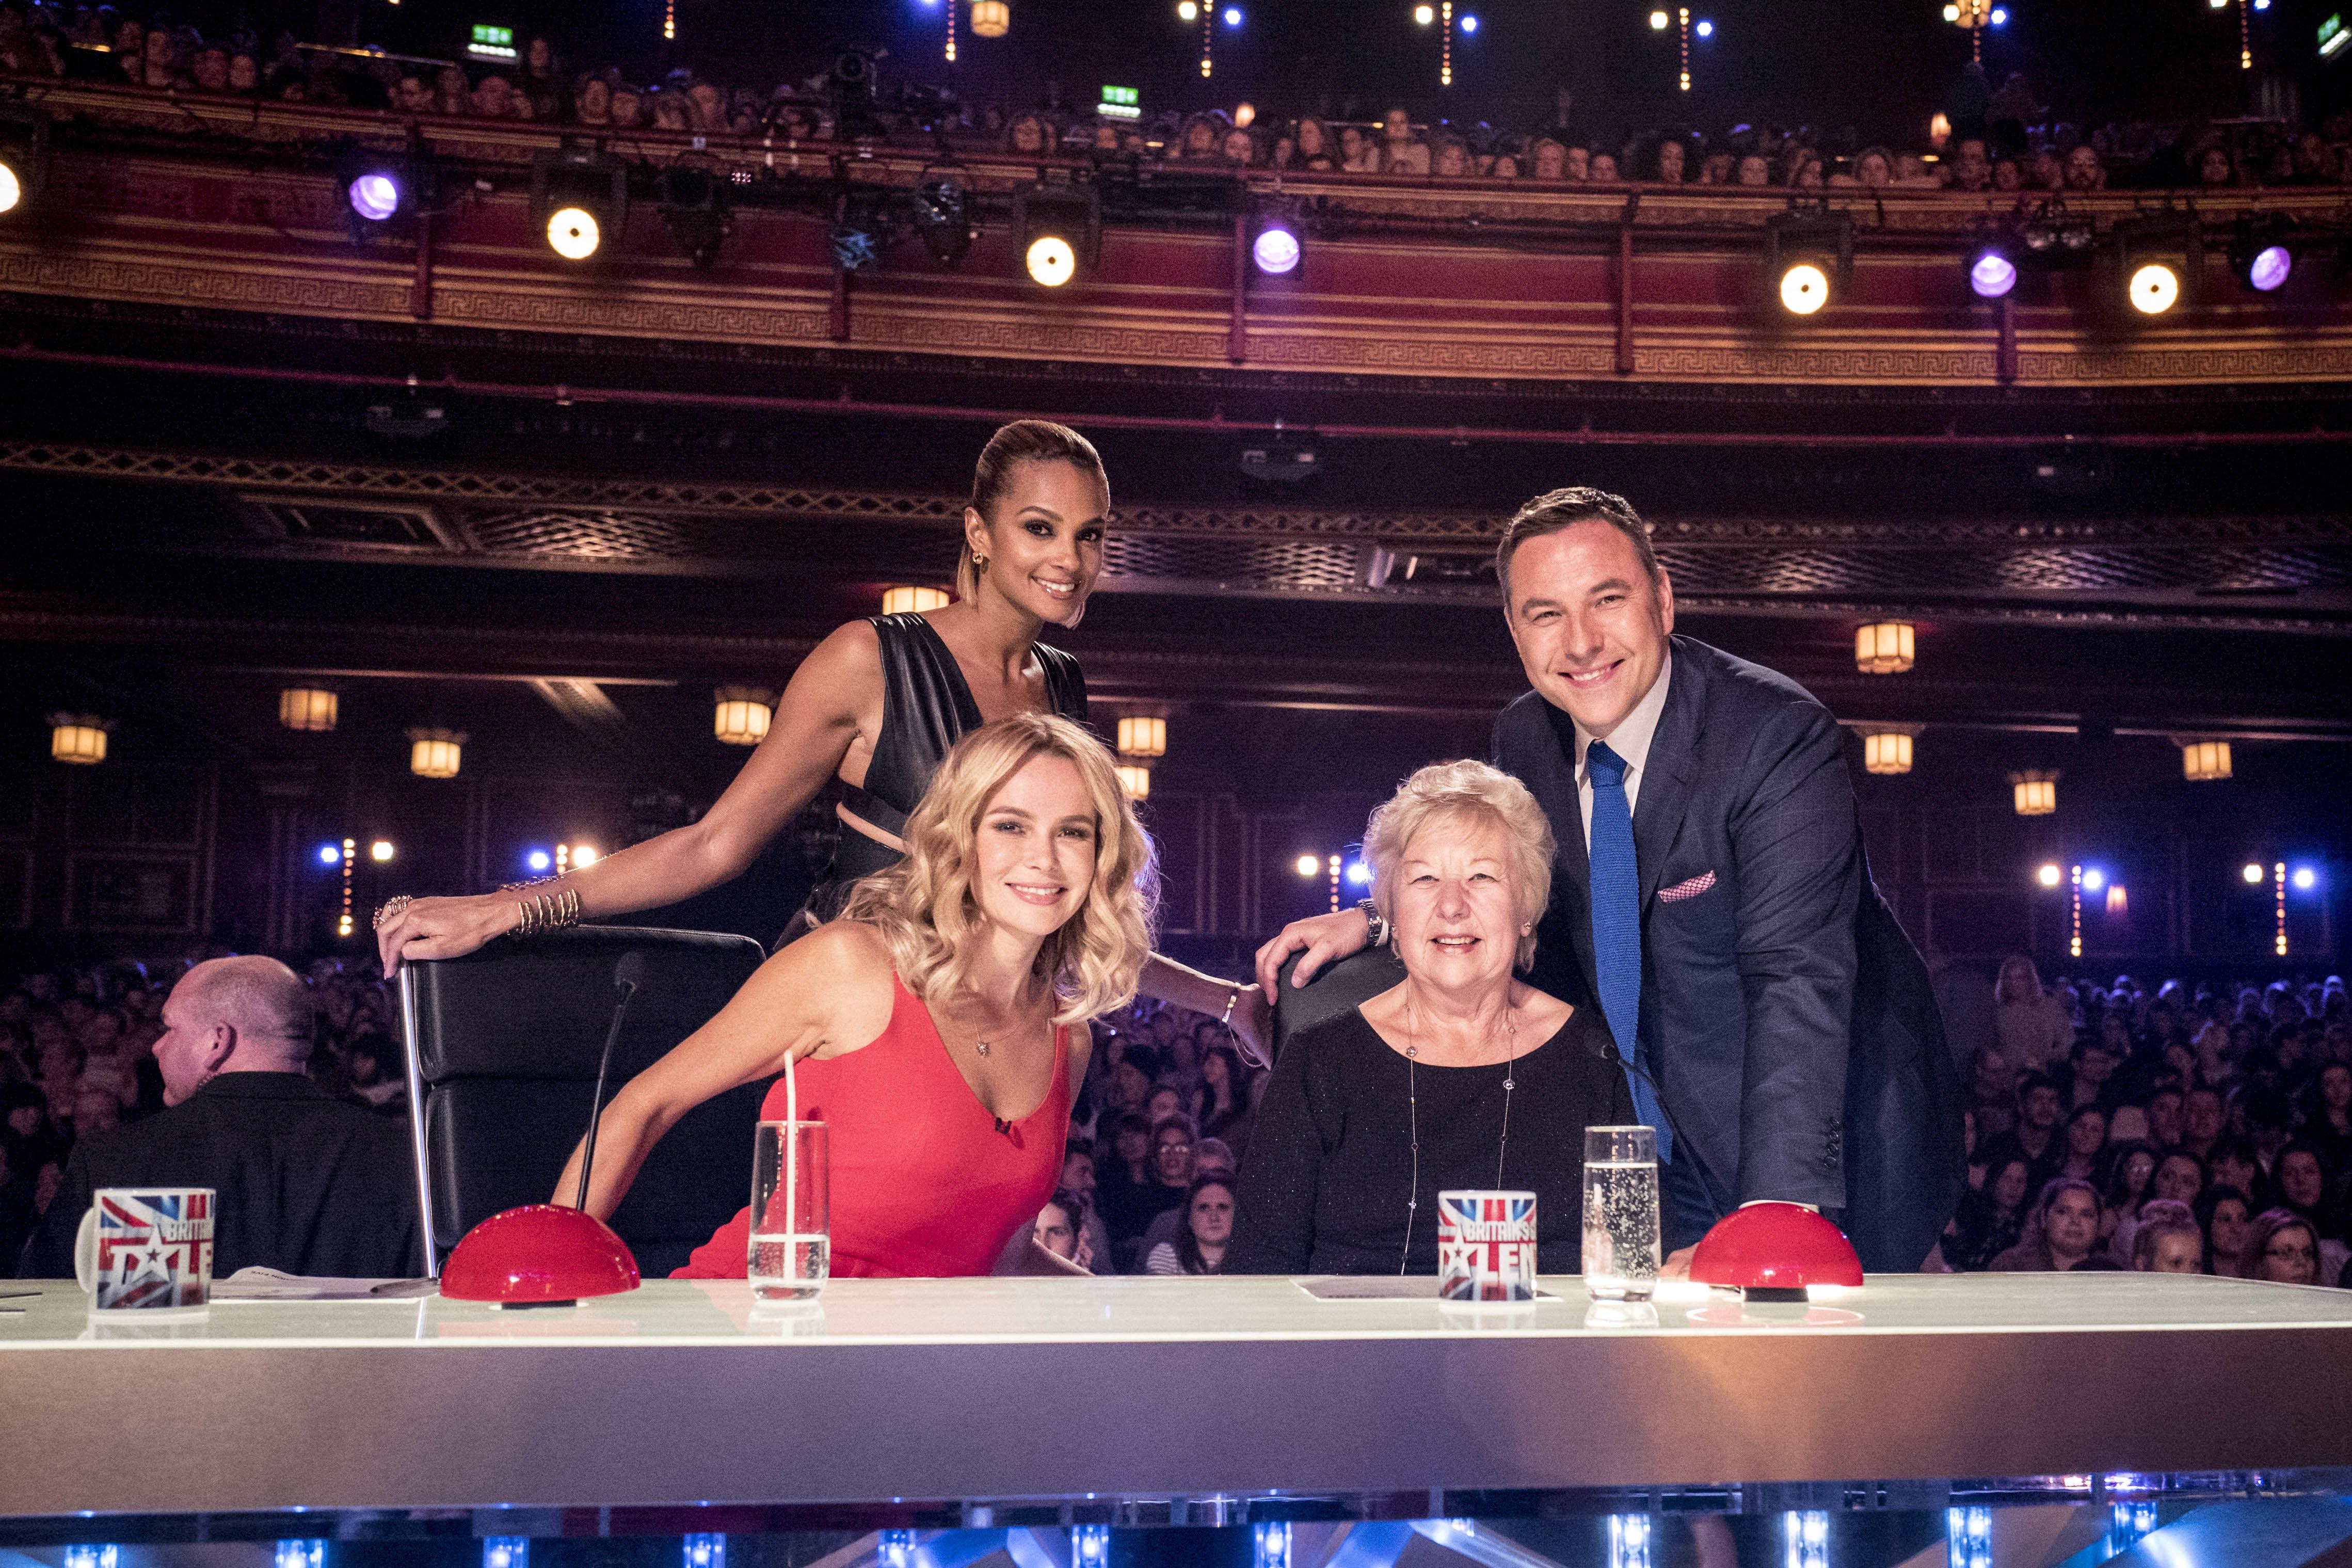 David Walliams' mum Kathleen joins the 'Britain's Got Talent'